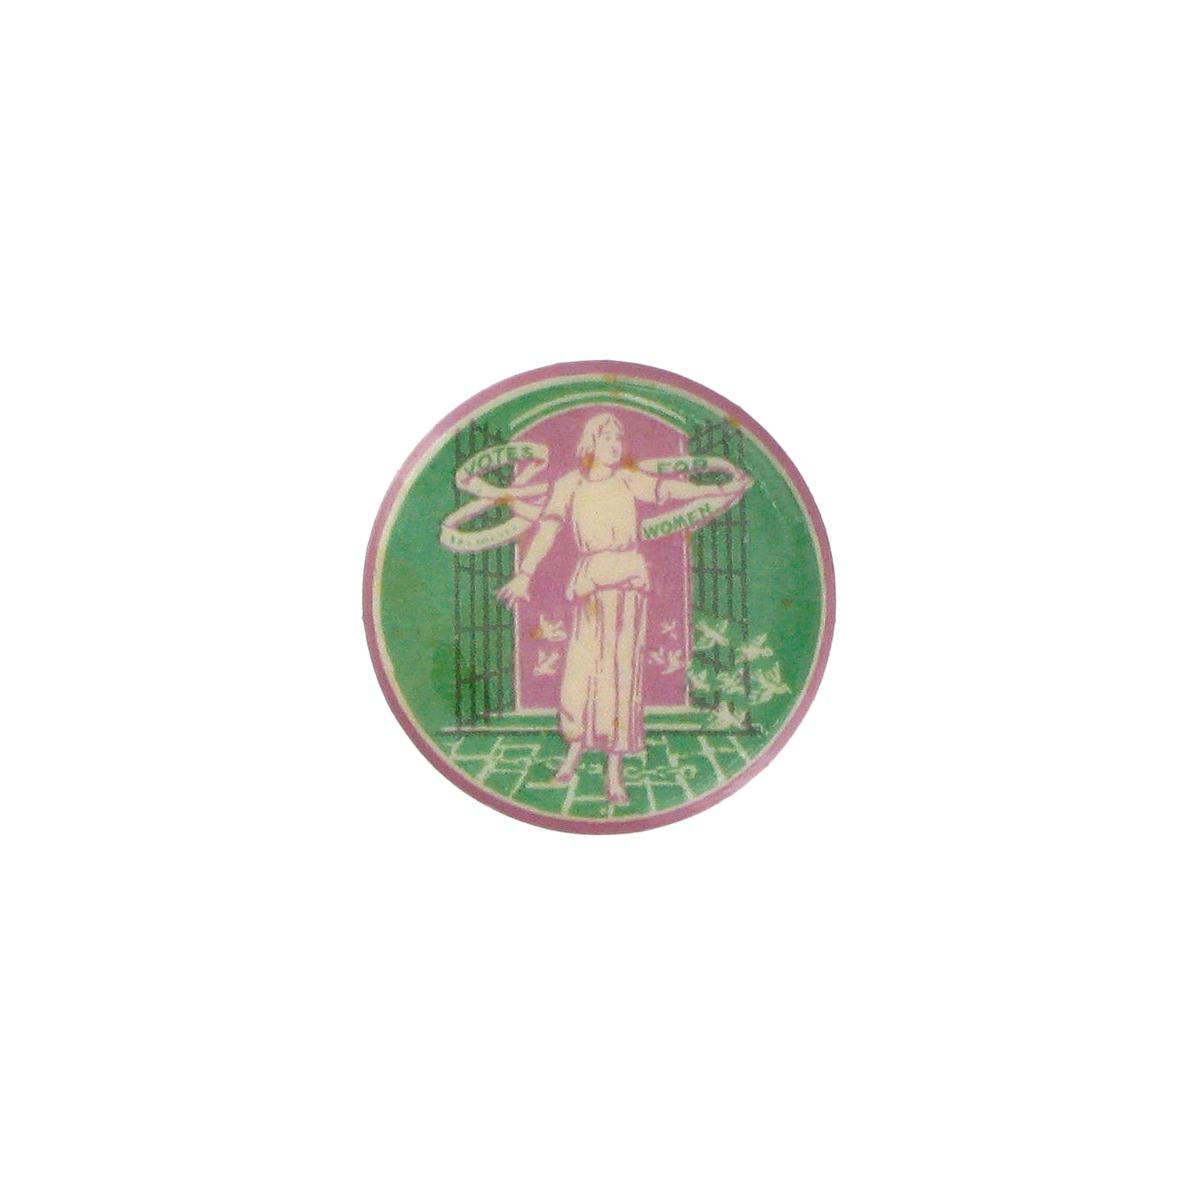 Sylvia Pankhurst pin badge